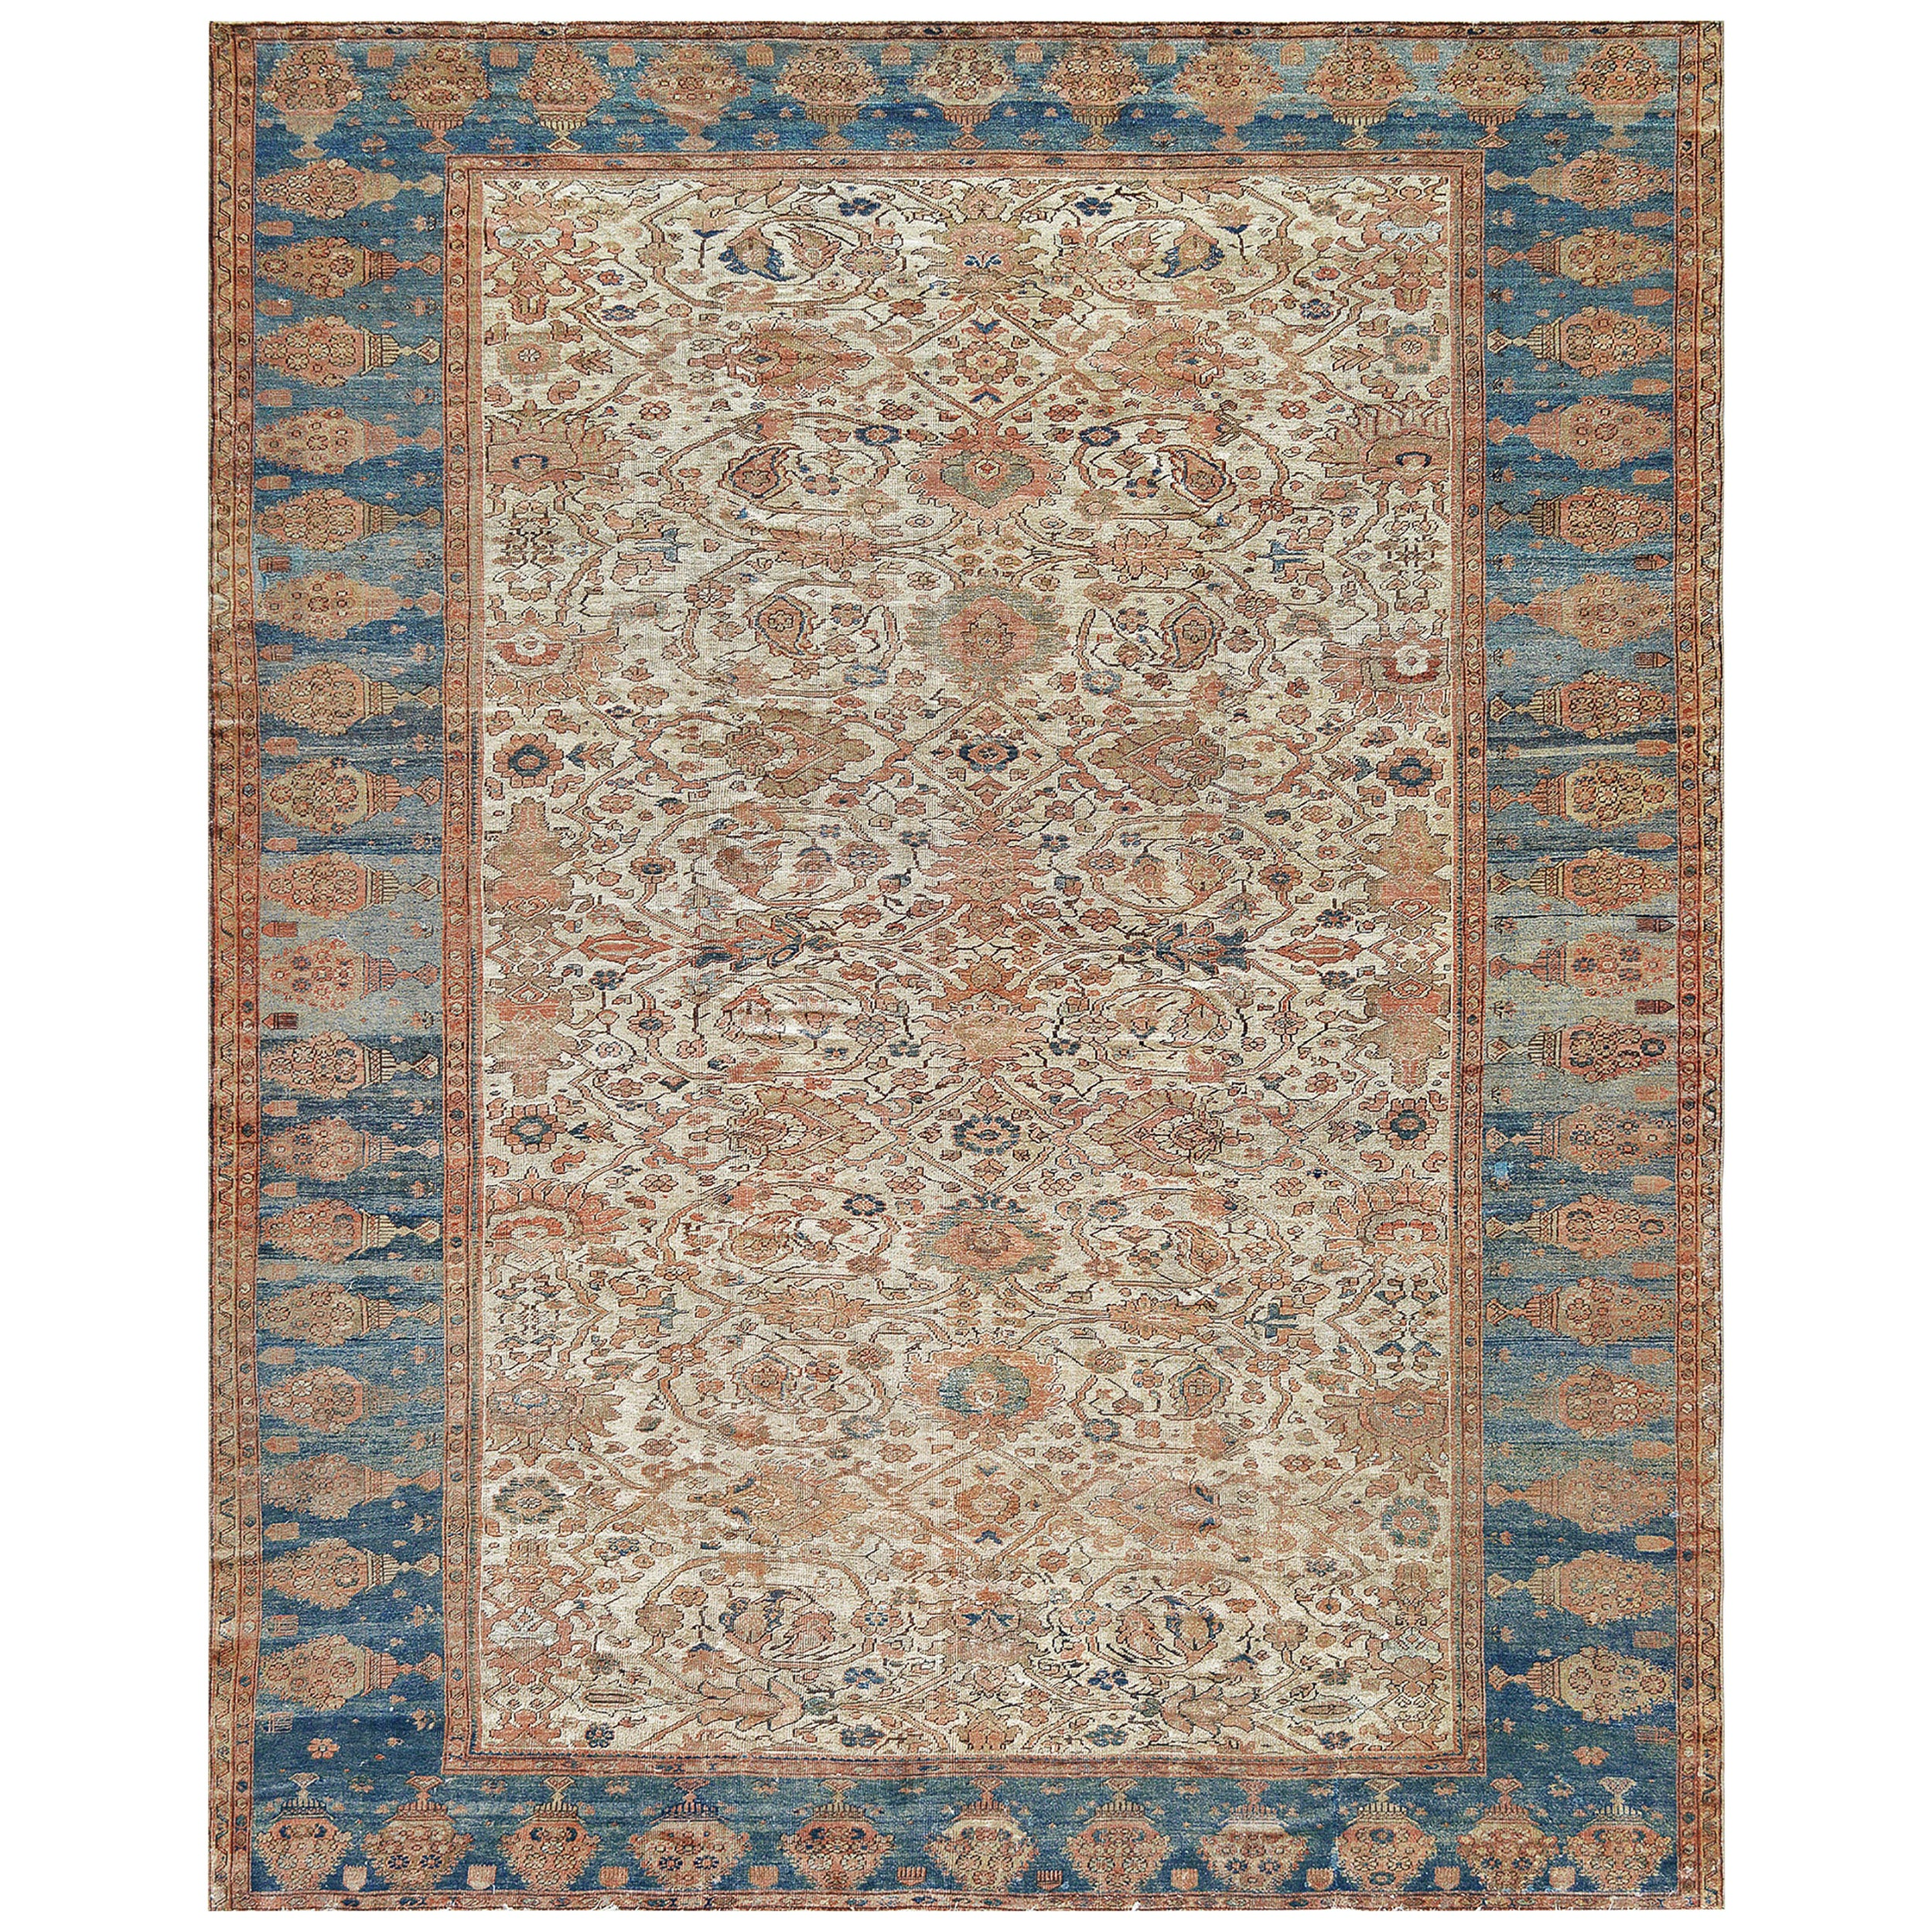 Traditional Handwoven Wool Persian Ziegler Sultanabad Rug